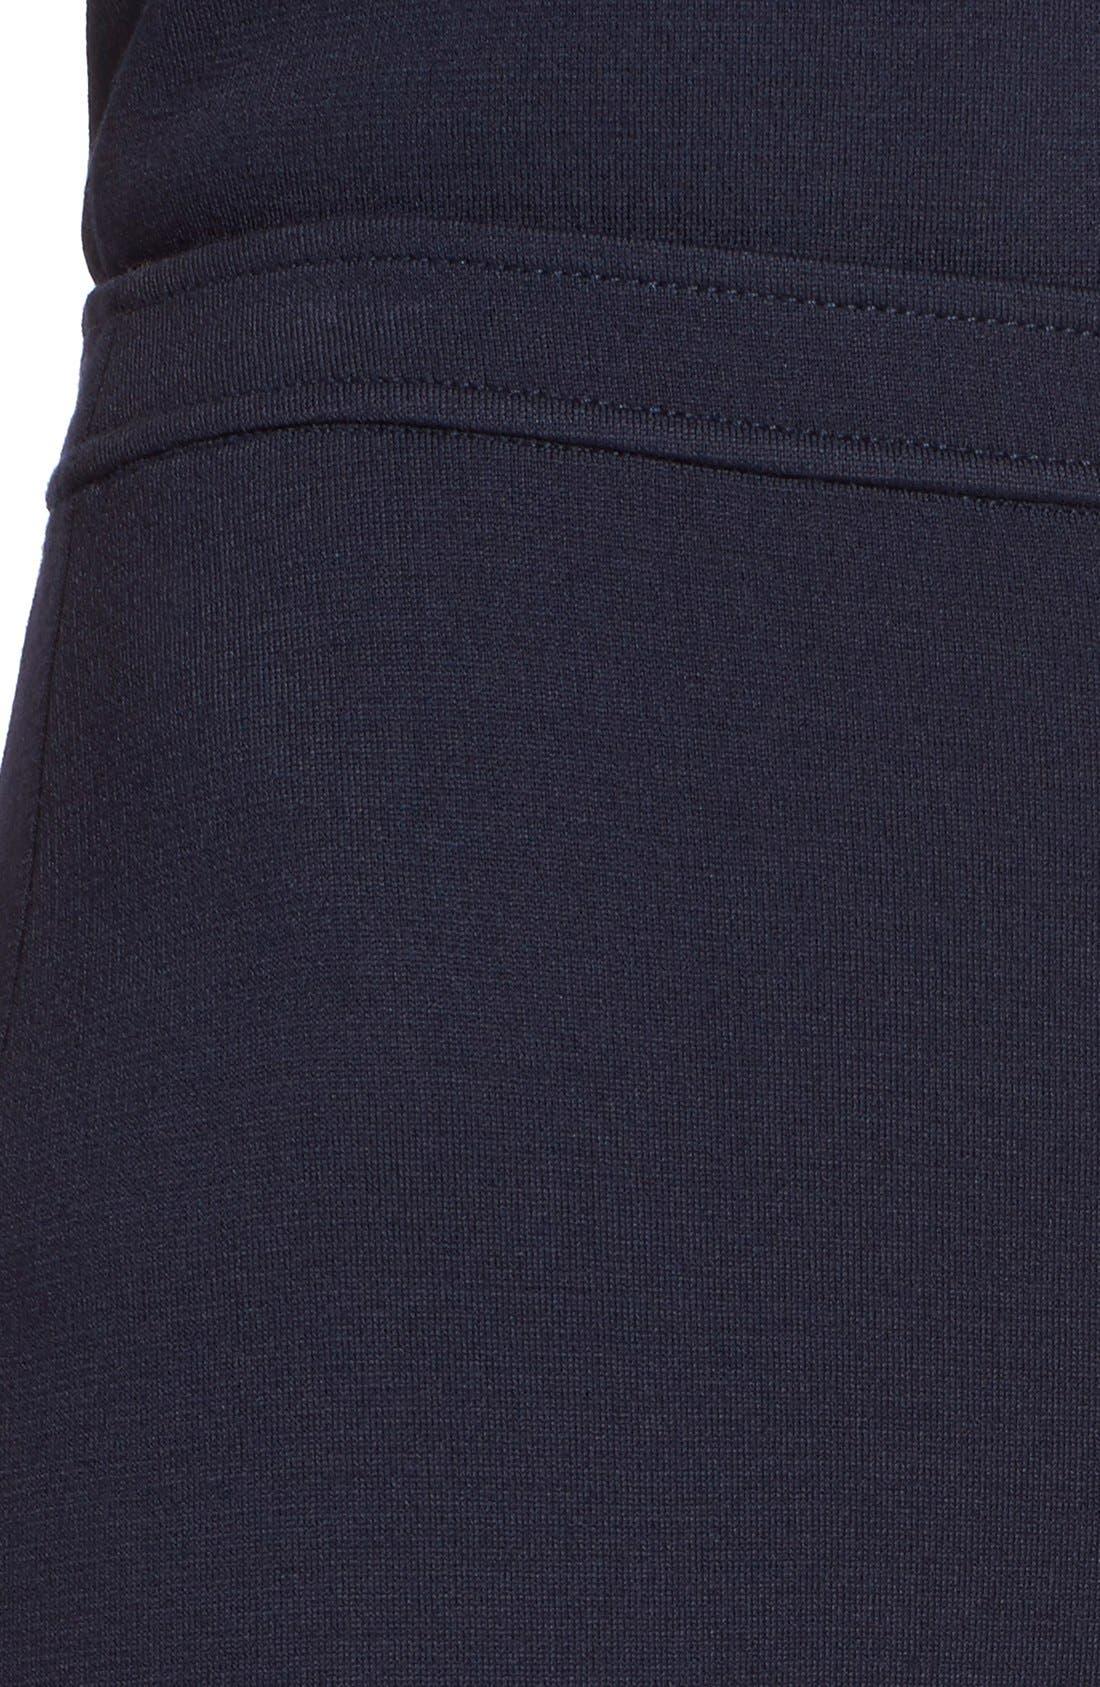 Alternate Image 5  - St. John Collection 'Alexa' Stretch Milano Knit Ankle Pants